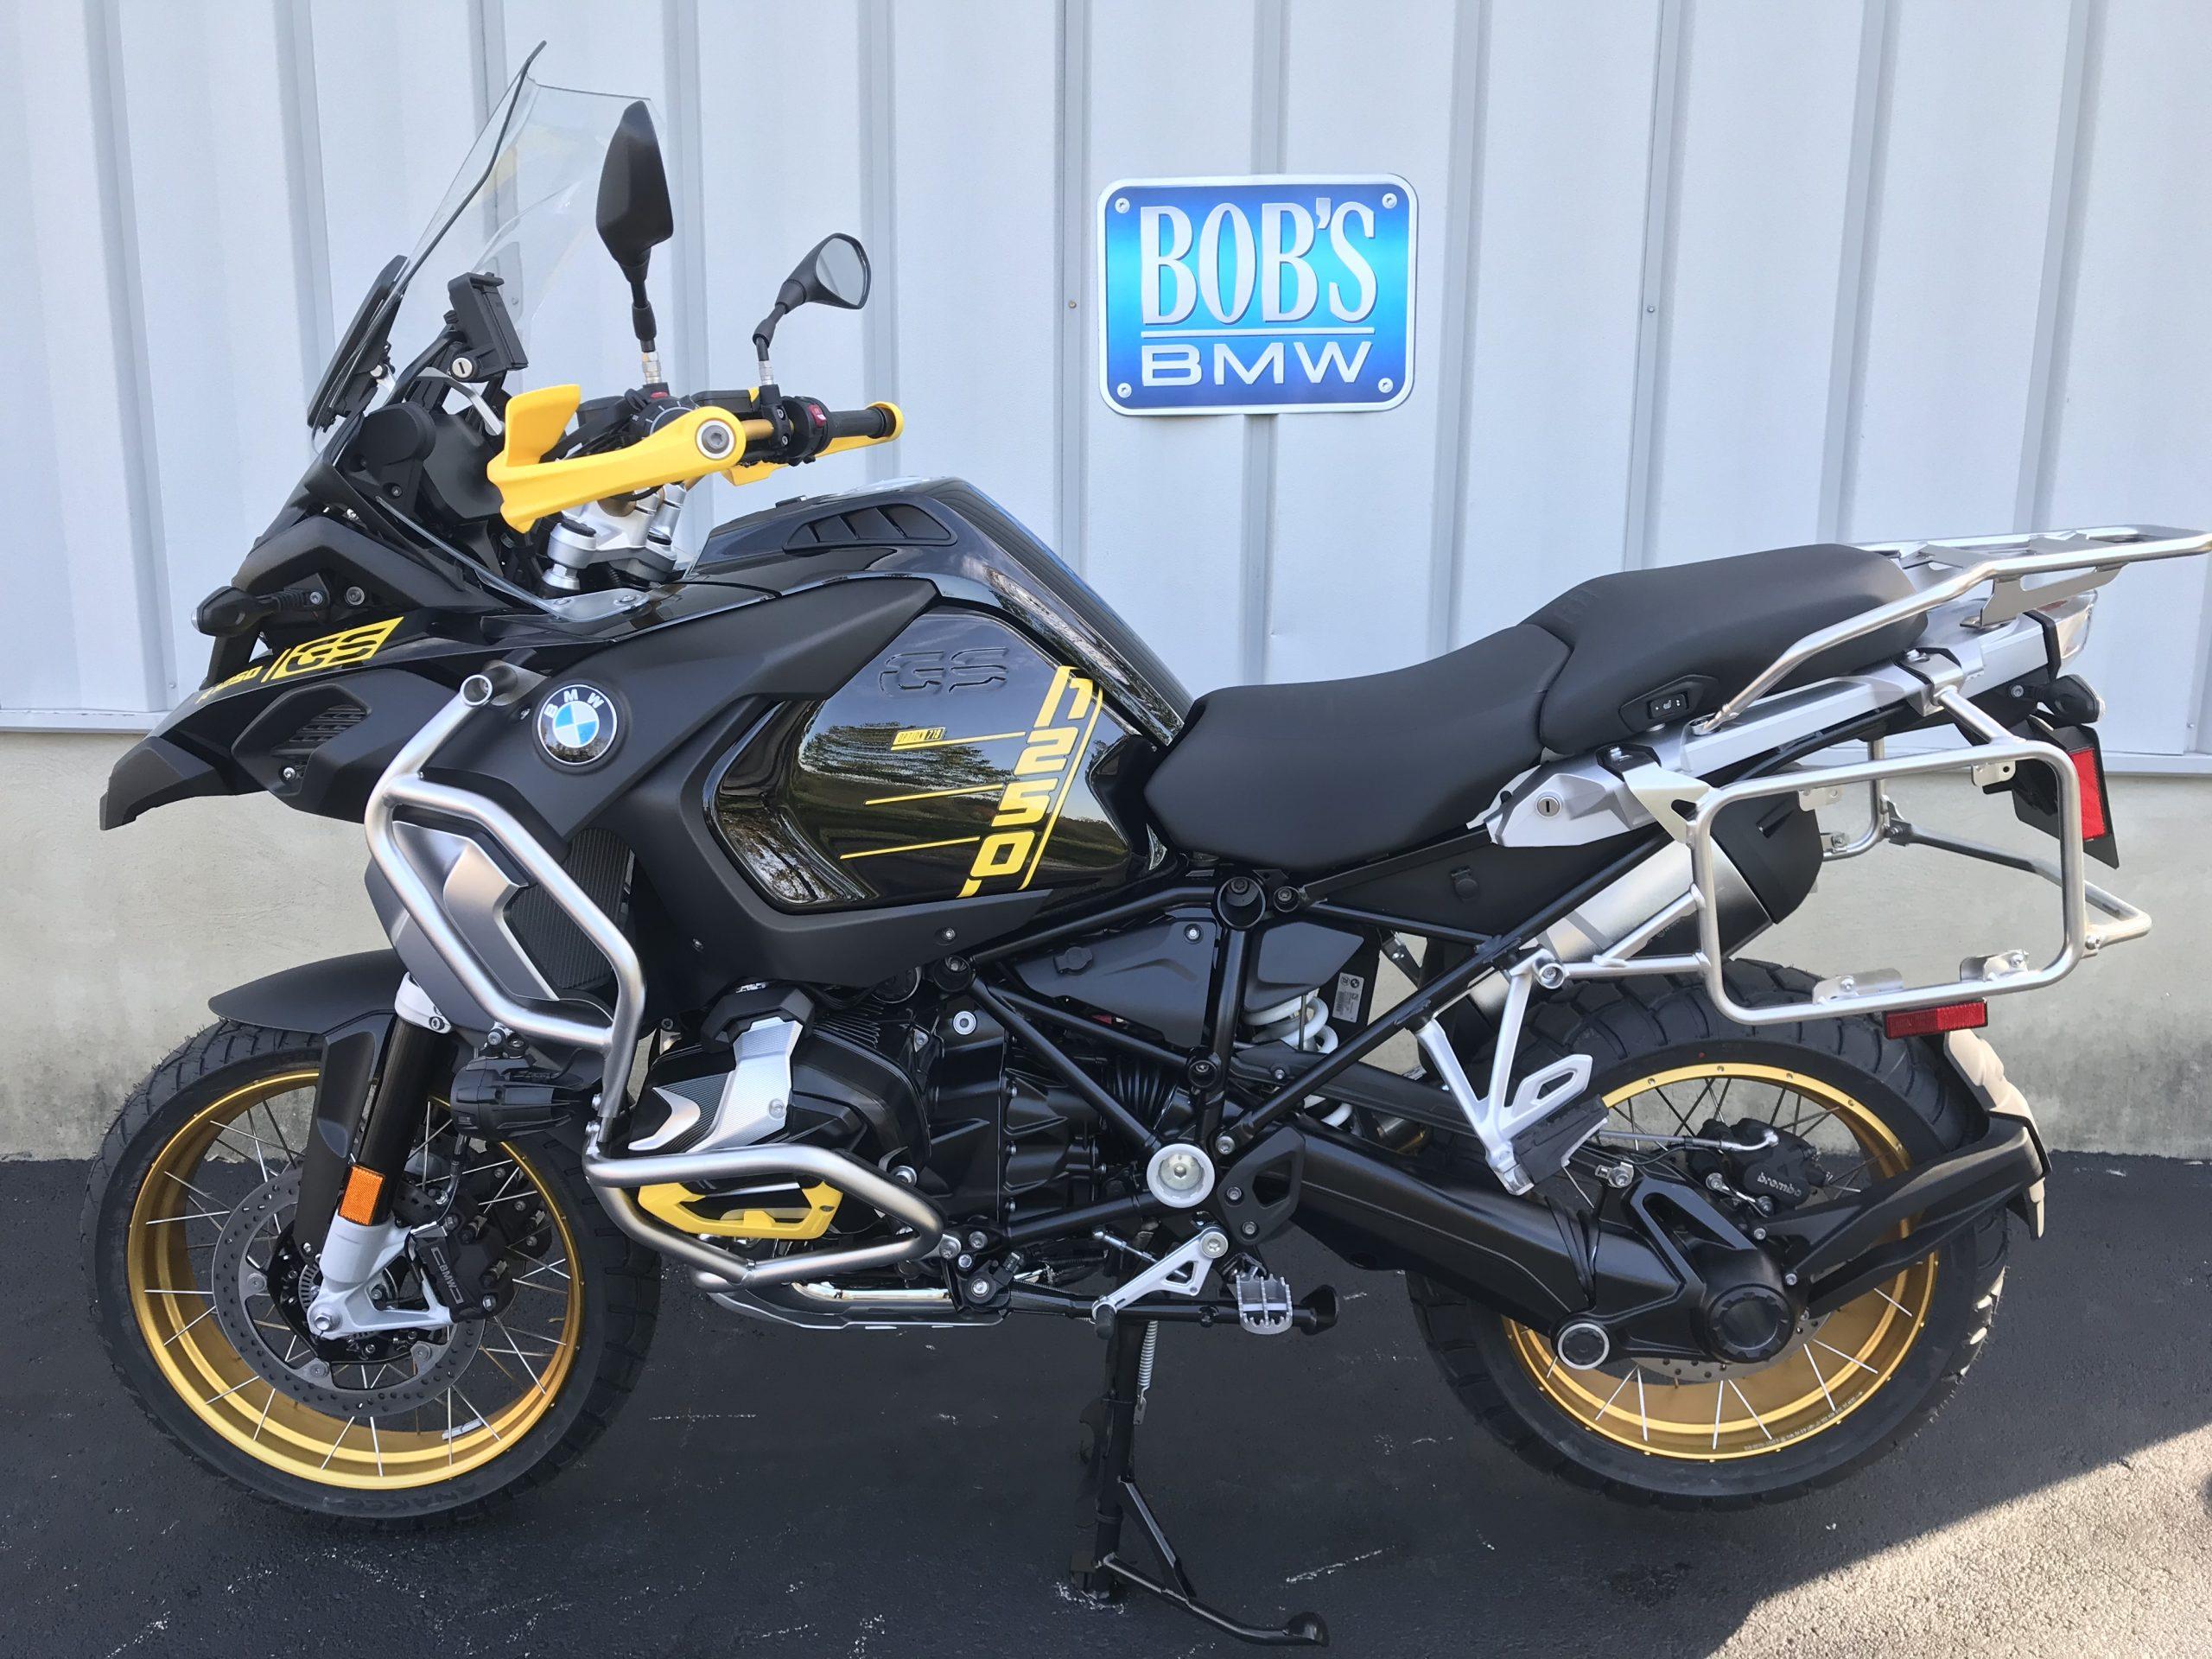 2021 Bmw R1250gs Adventure Bob S Bmw Motorcycles